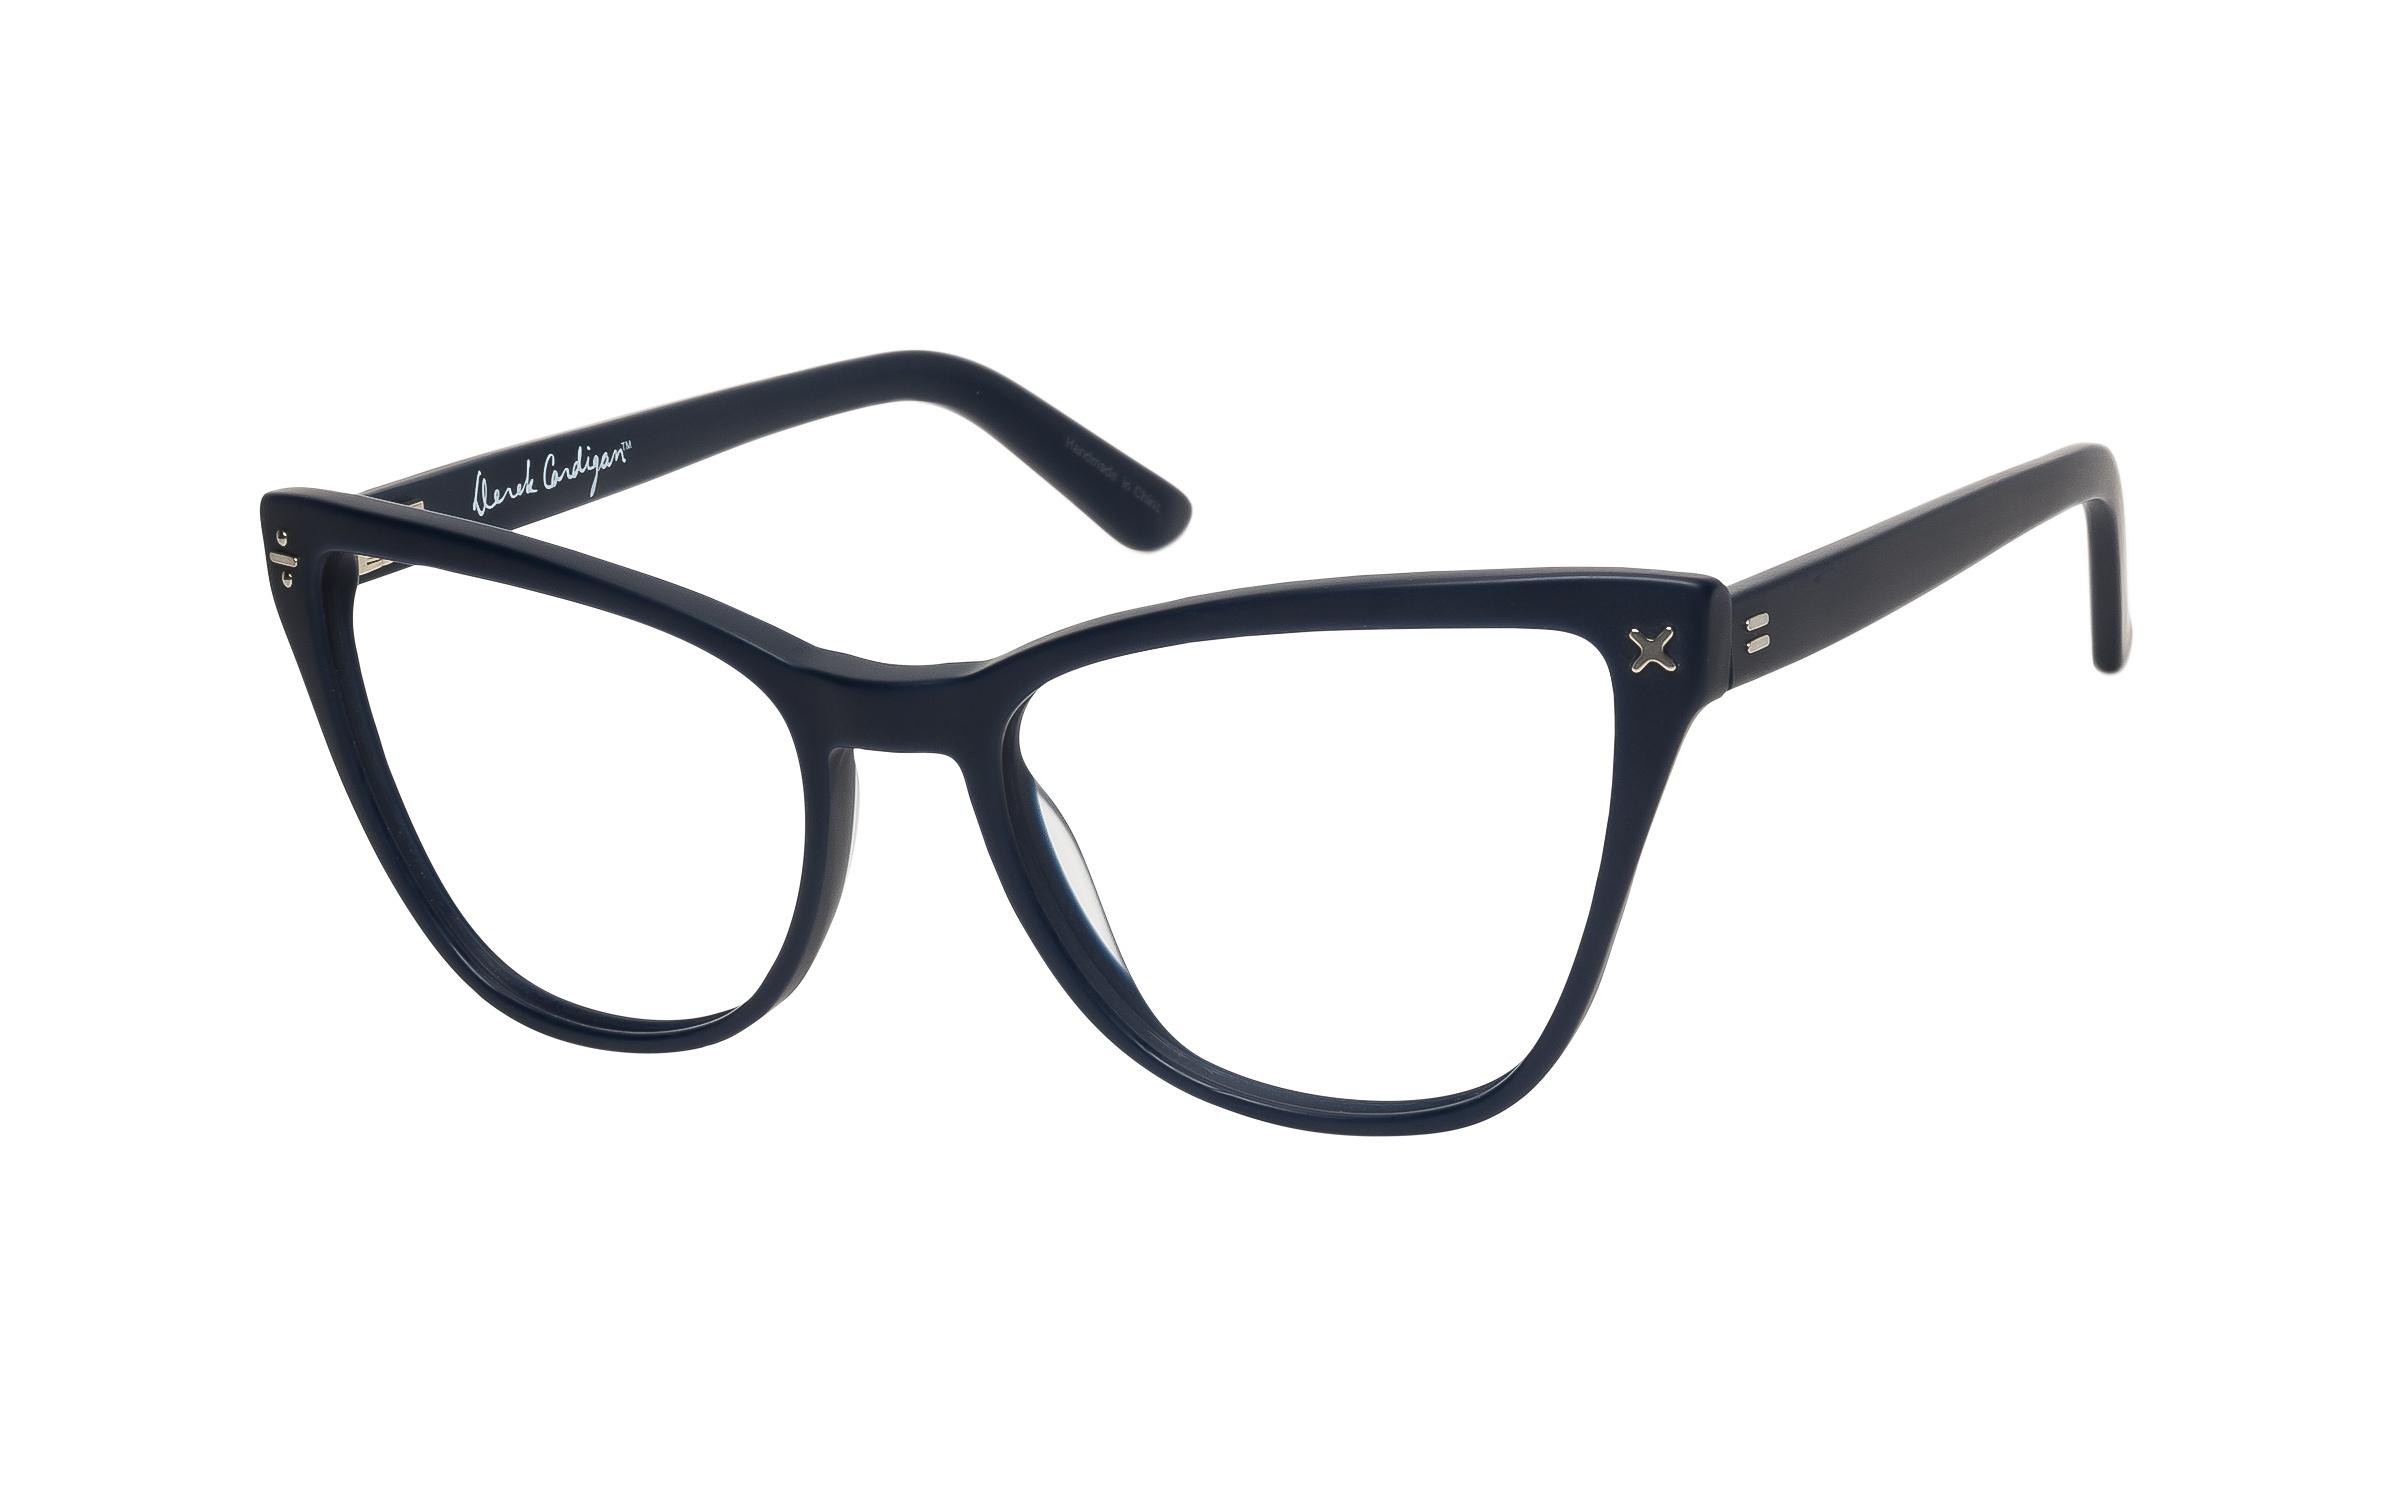 Women's Vintage Glasses Blue Derek Cardigan Online Clearly